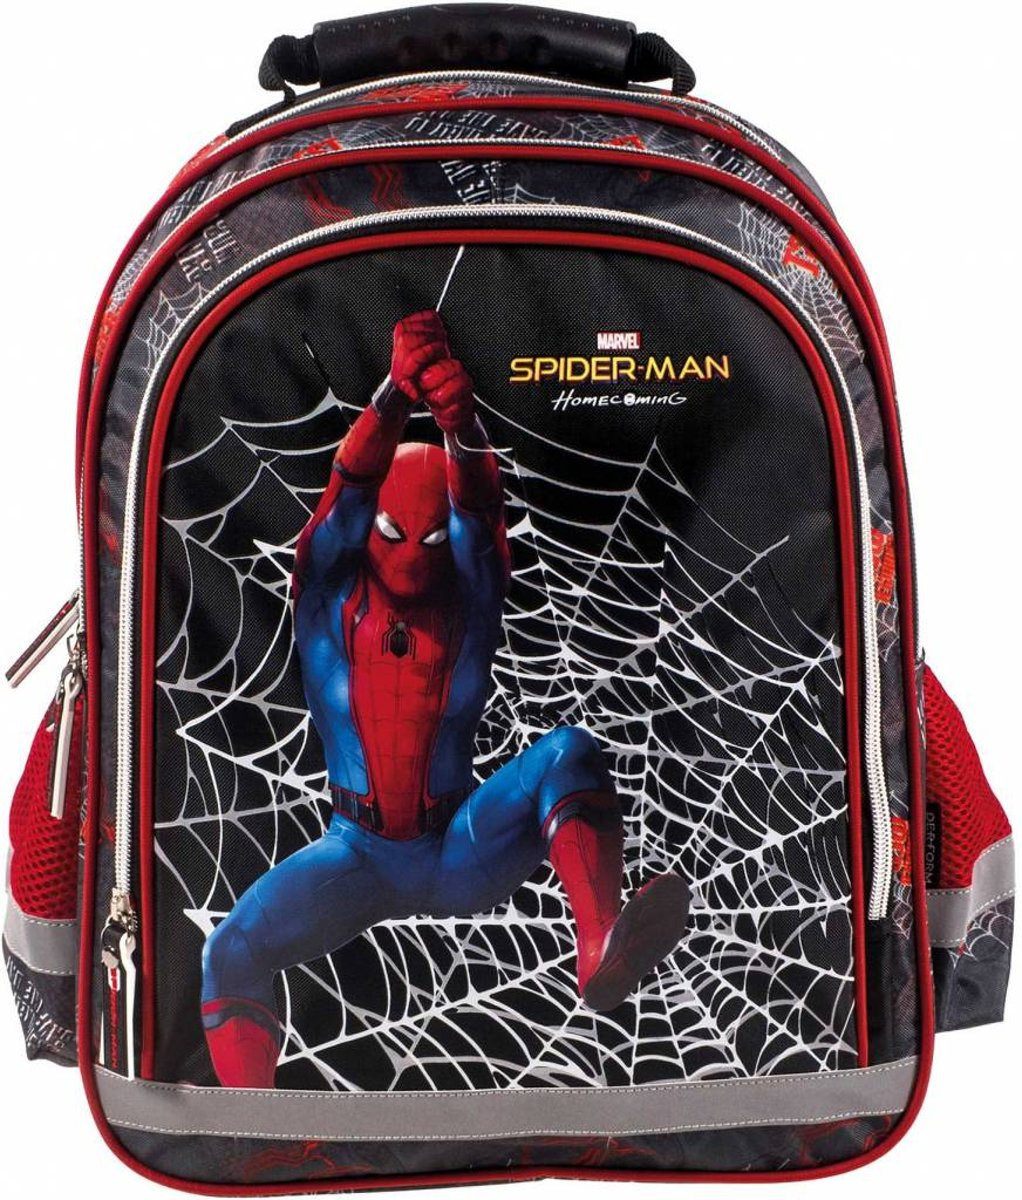 3344796ea50 bol.com   Spider-Man Homecoming - Rugzak - 38 x 28 x 16 cm - Multi